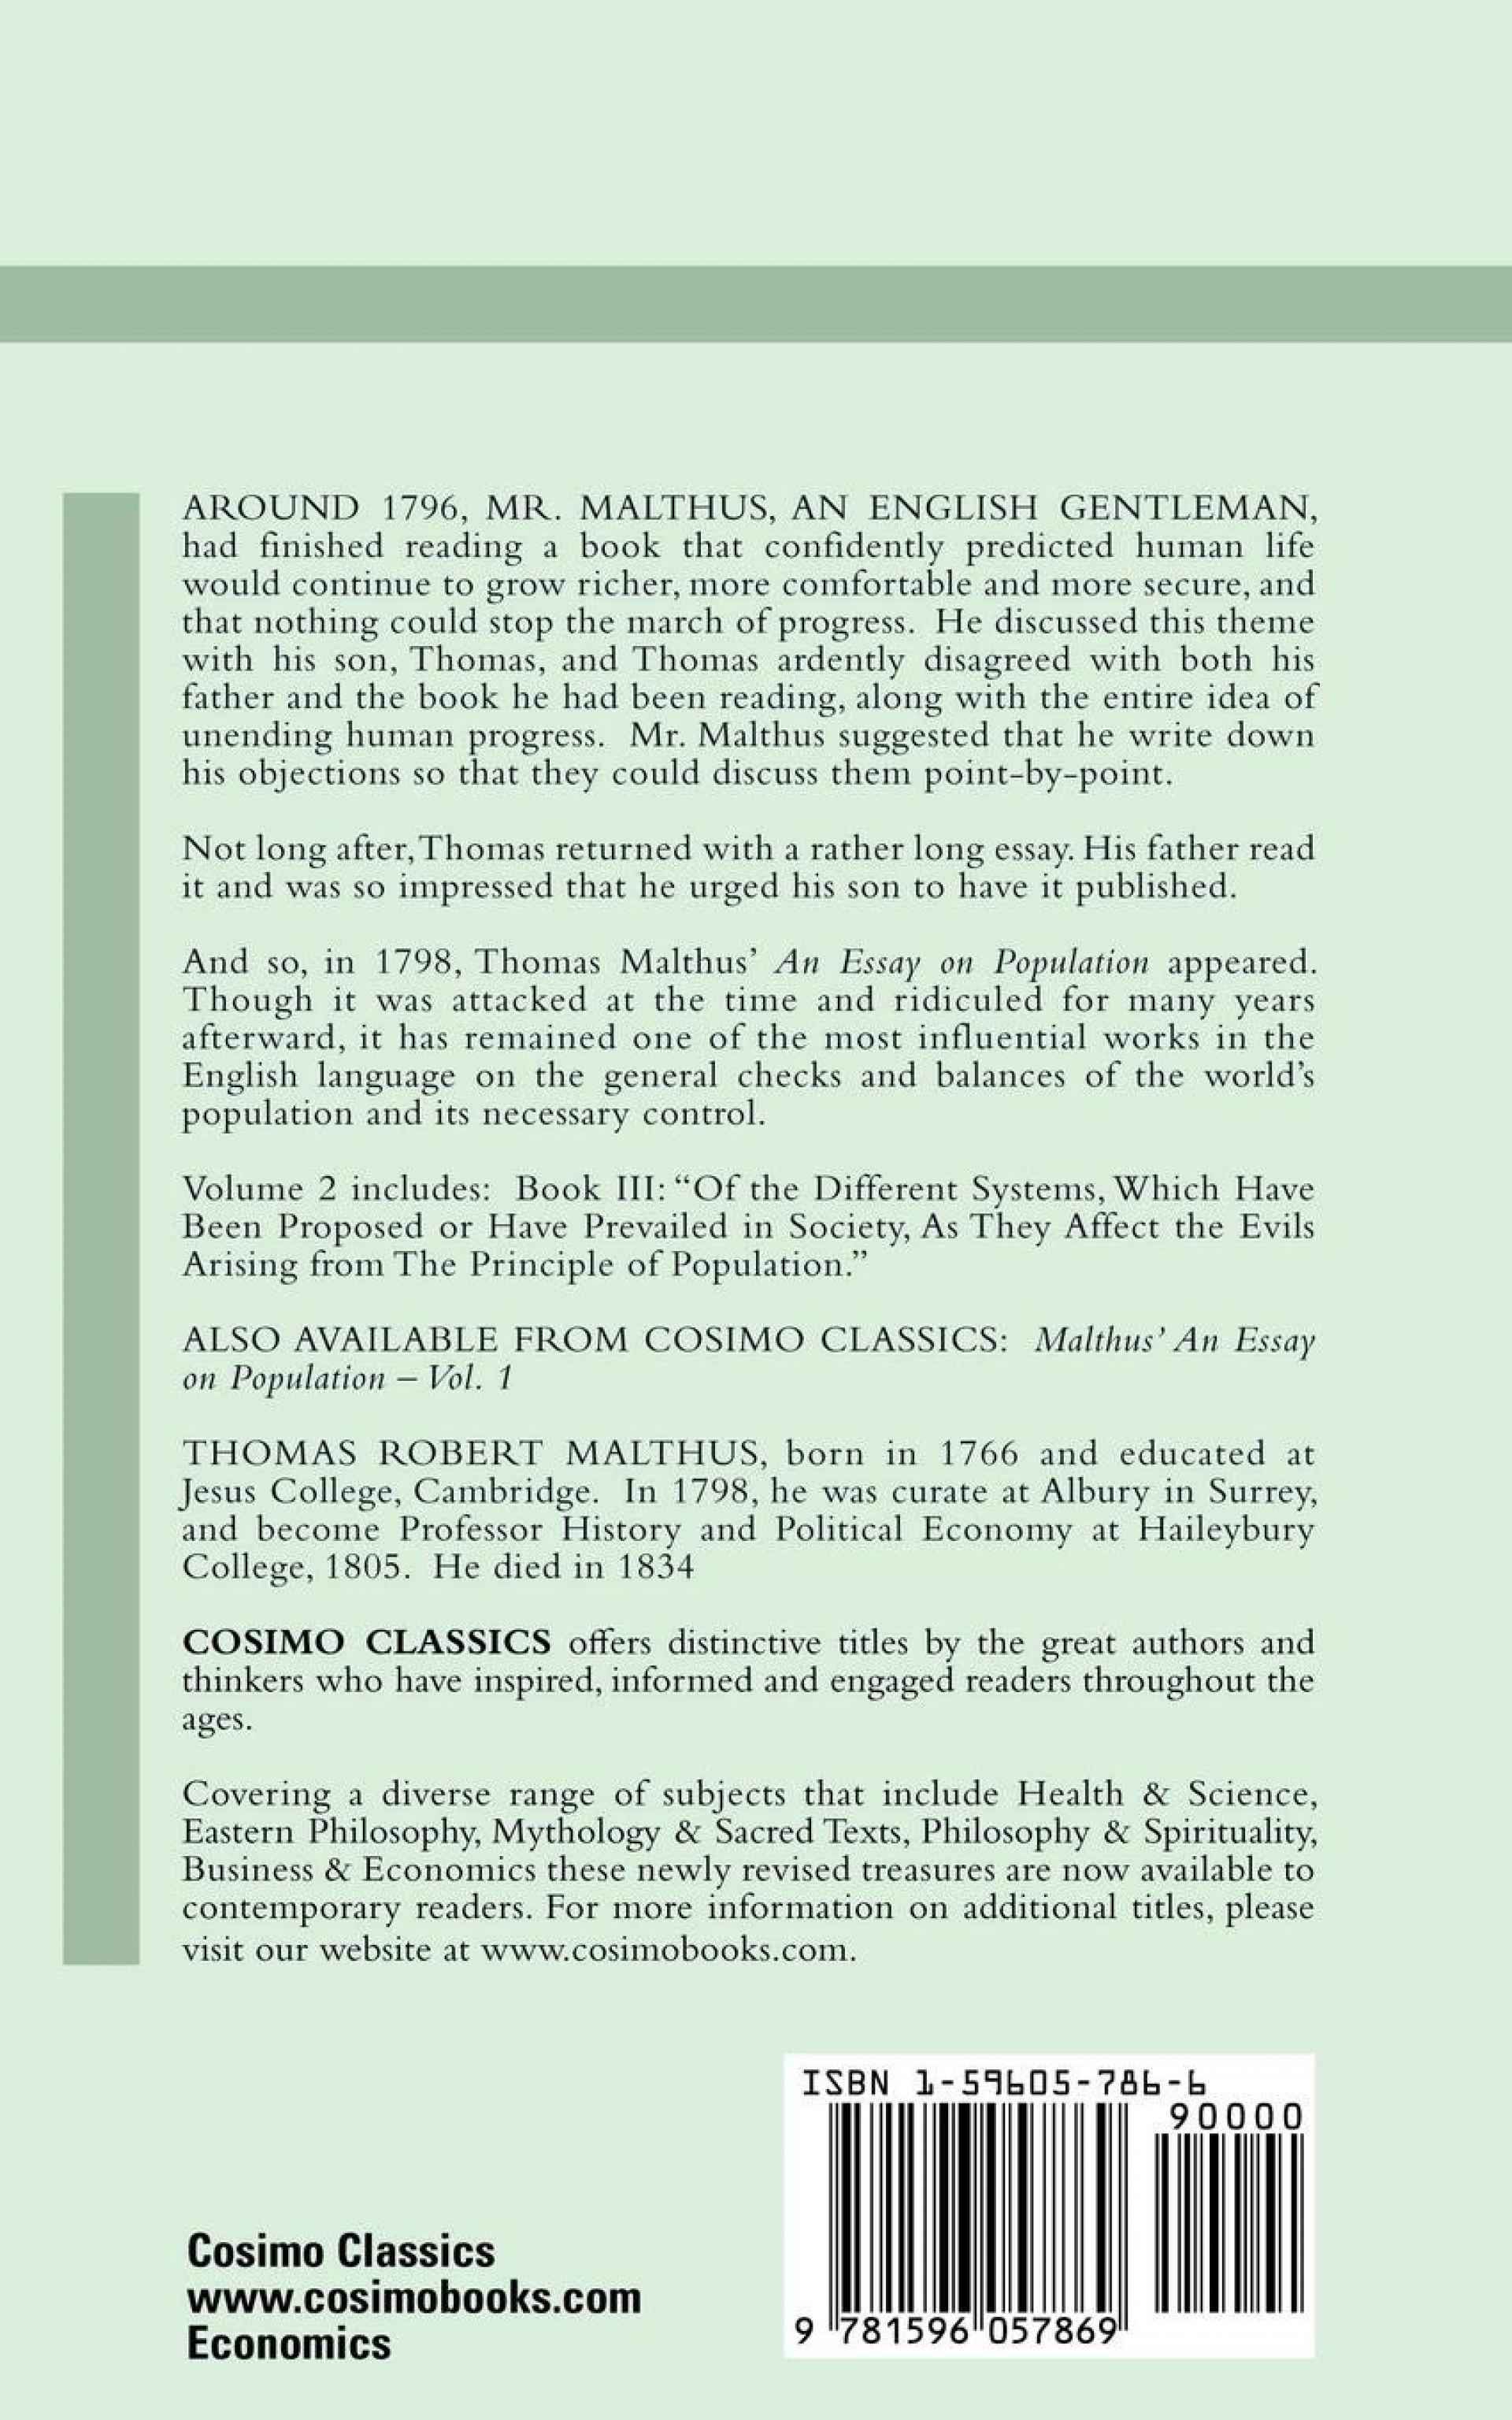 012 Ijdz7bvl Essay Example On Impressive Population Control Explosion In Kannada Pakistan 1920